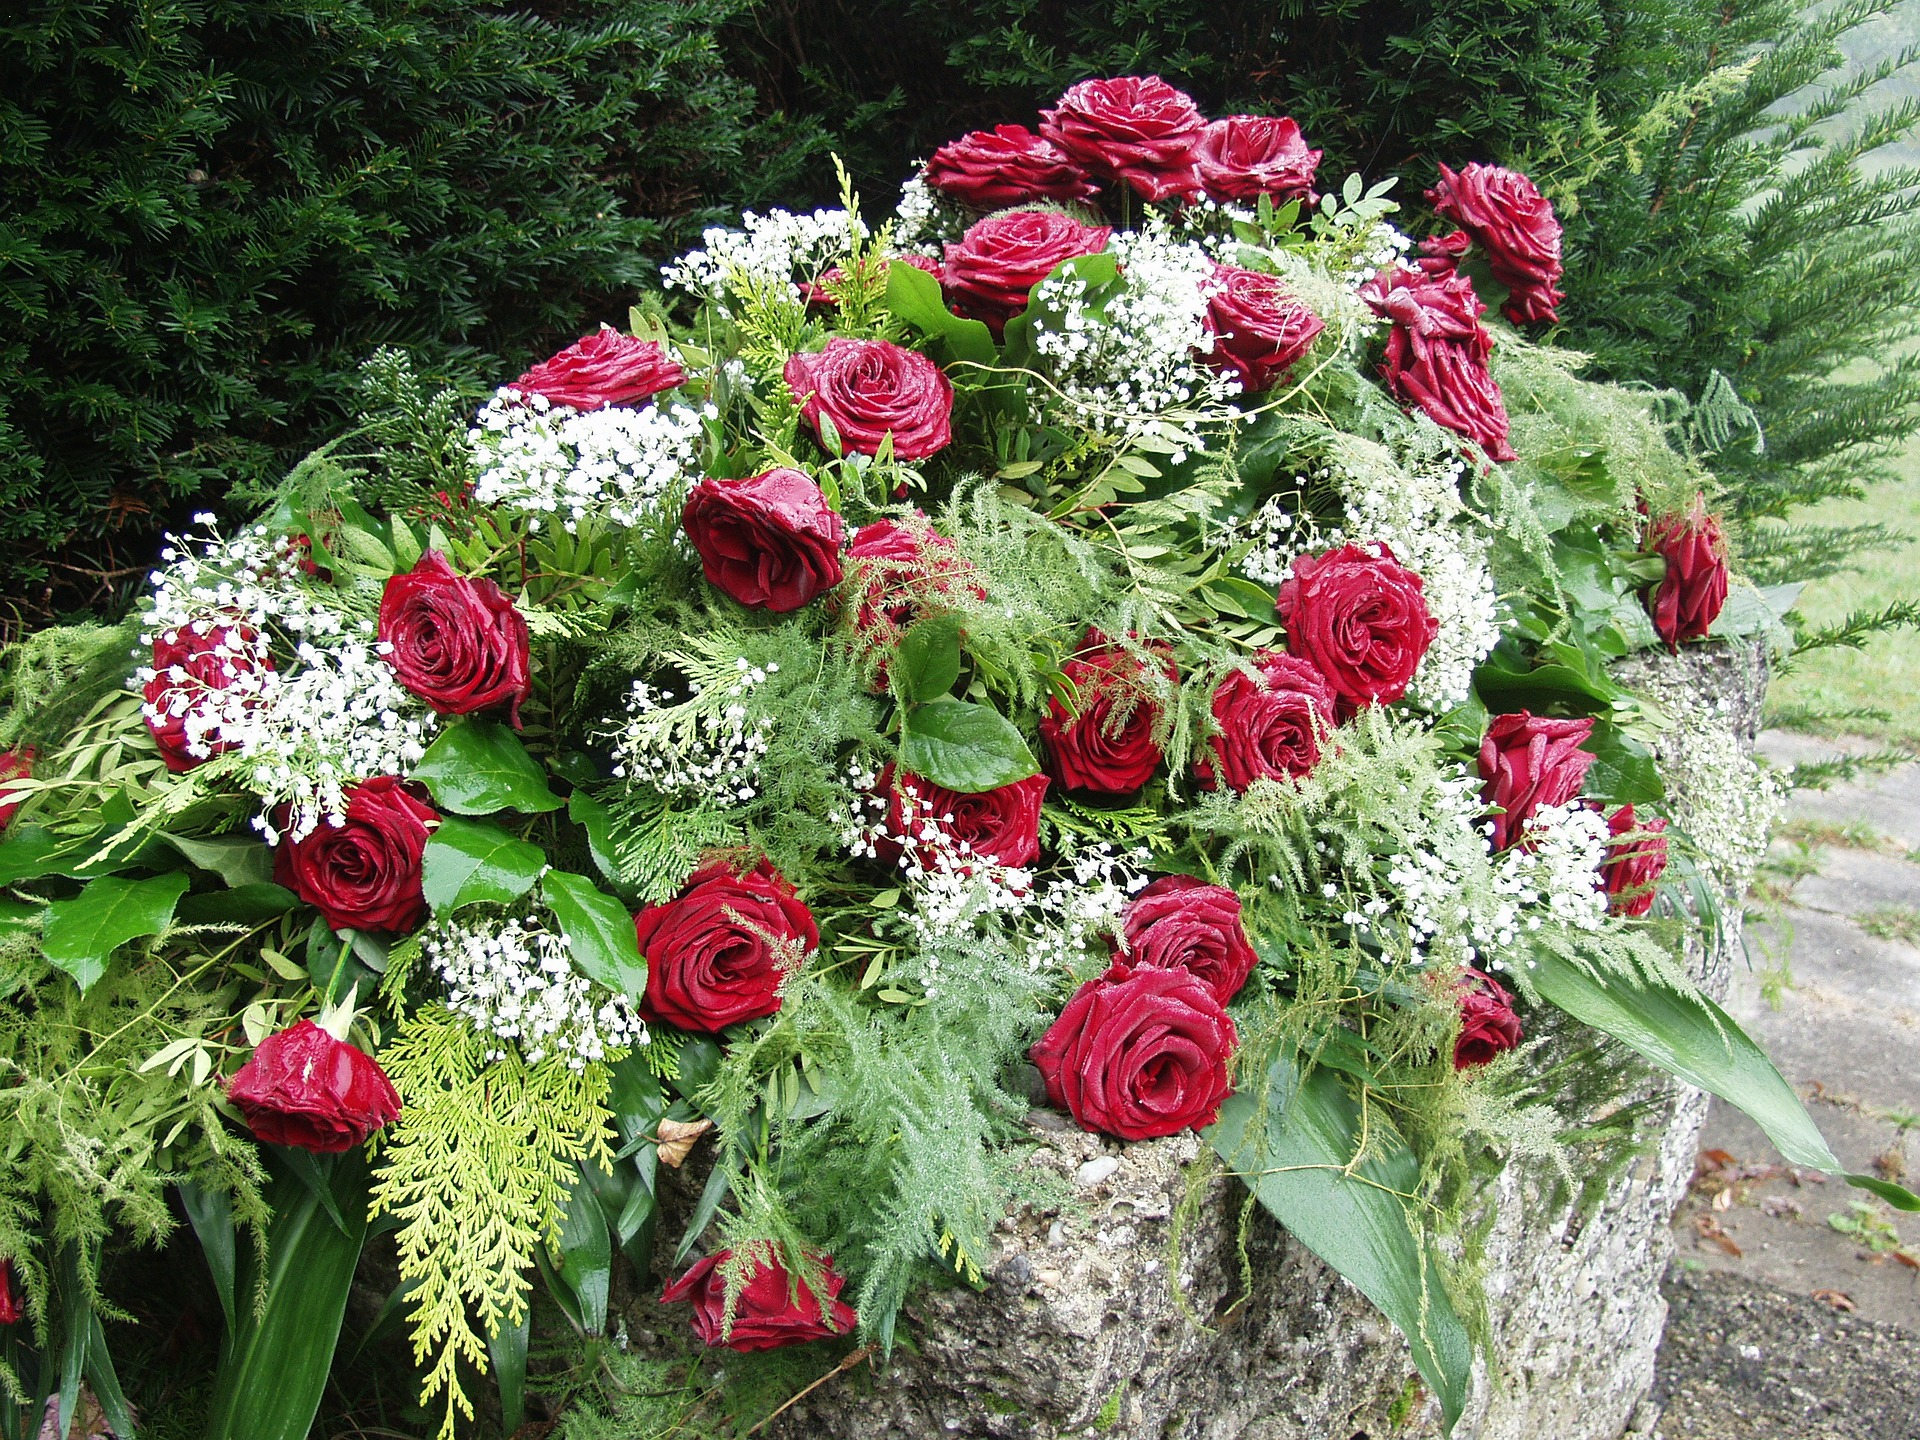 roses 61203 1920 jpg?fit=1920,1440&ssl=1.'